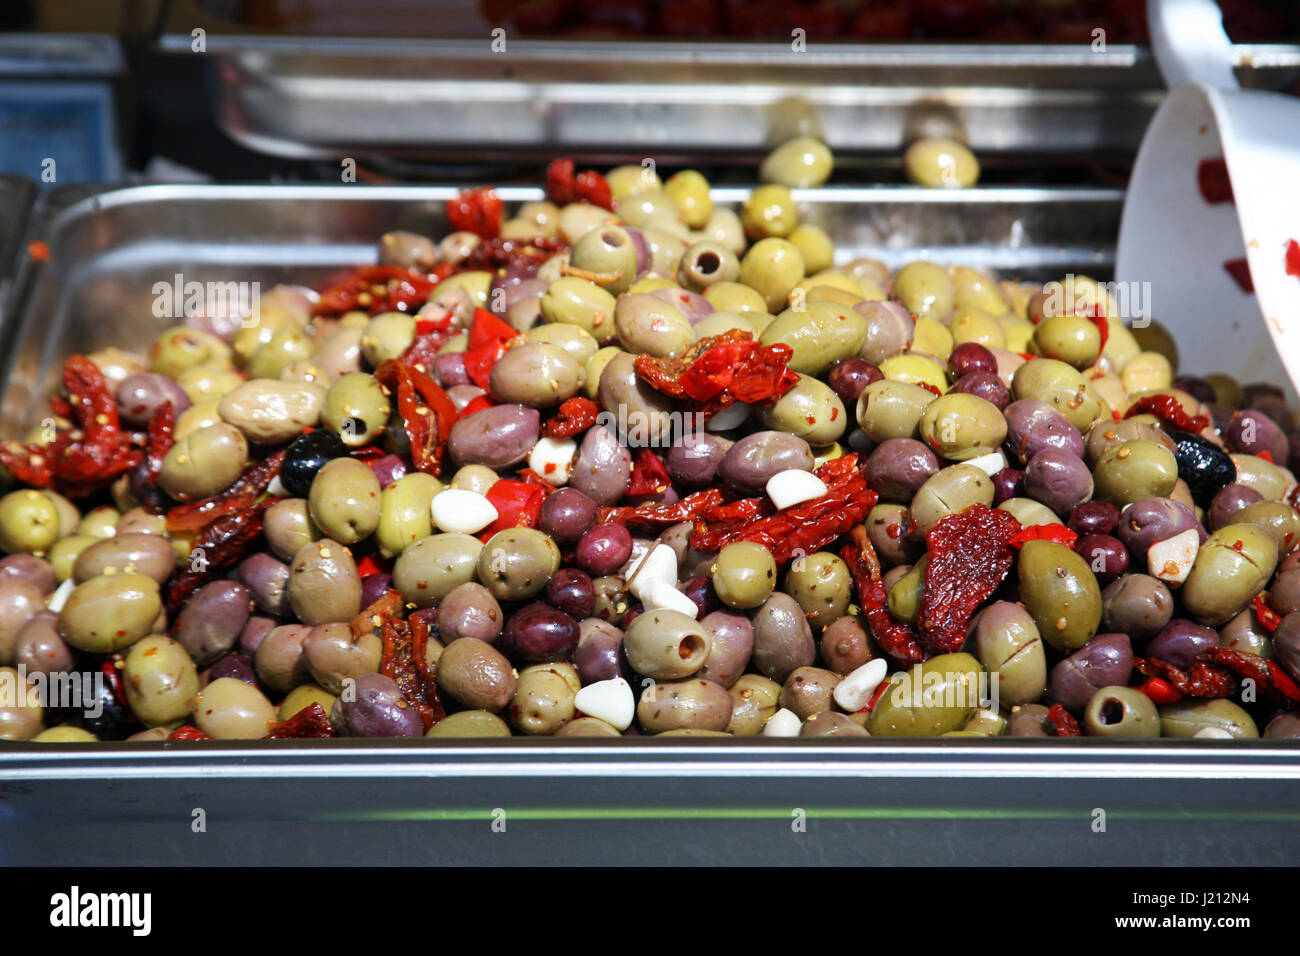 Italian delights,olives,springtime fair in Zagreb,Croatia,Europe,3 - Stock Image